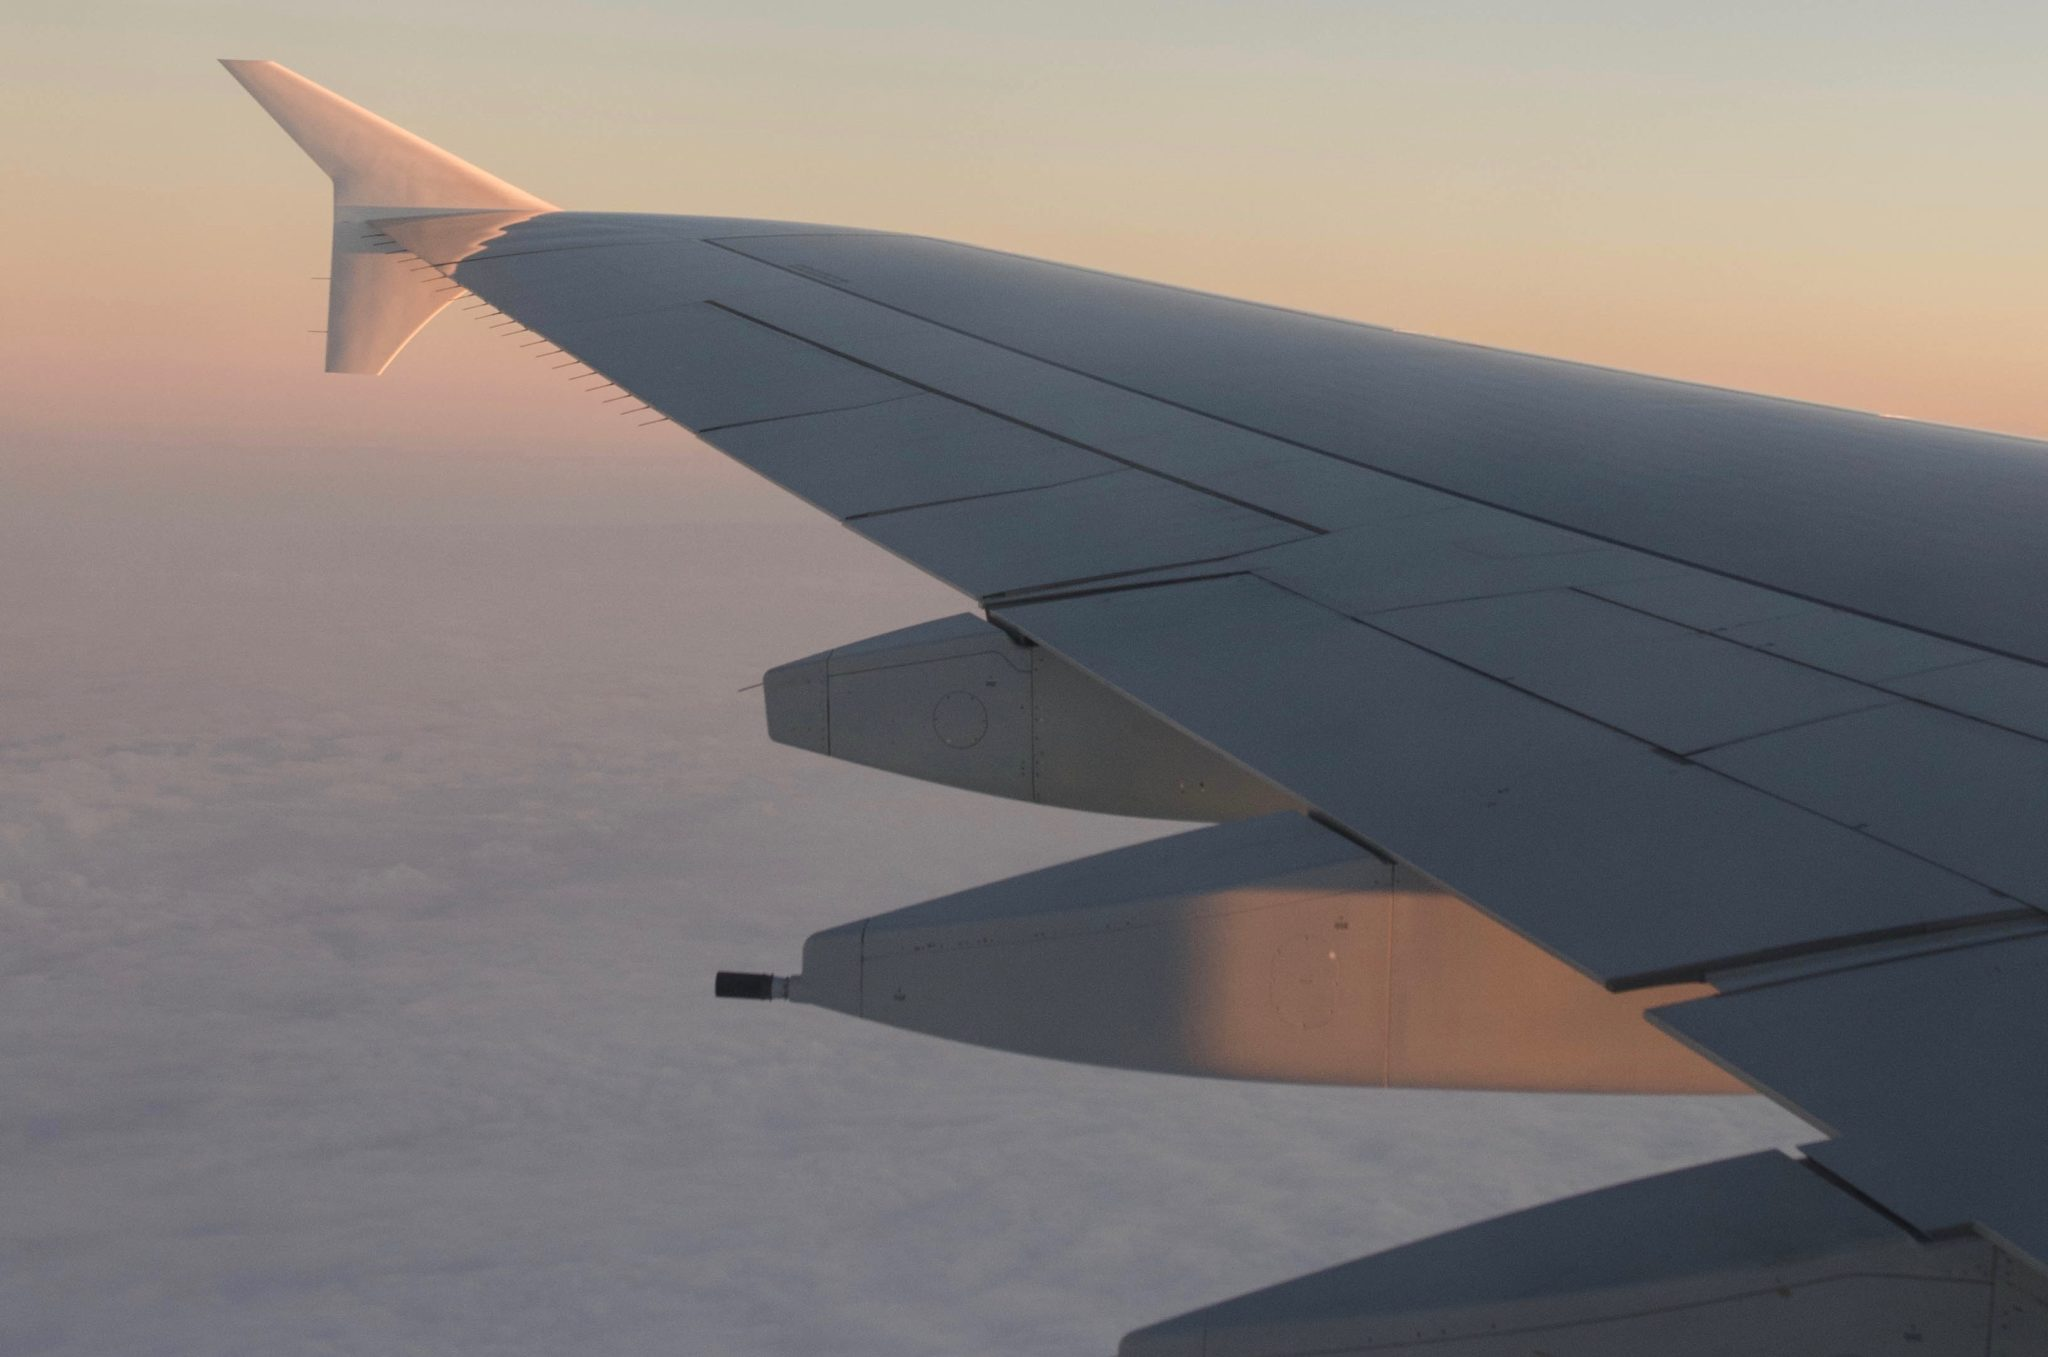 Emirates Business Class im A380 von Hongkong nach Dubai